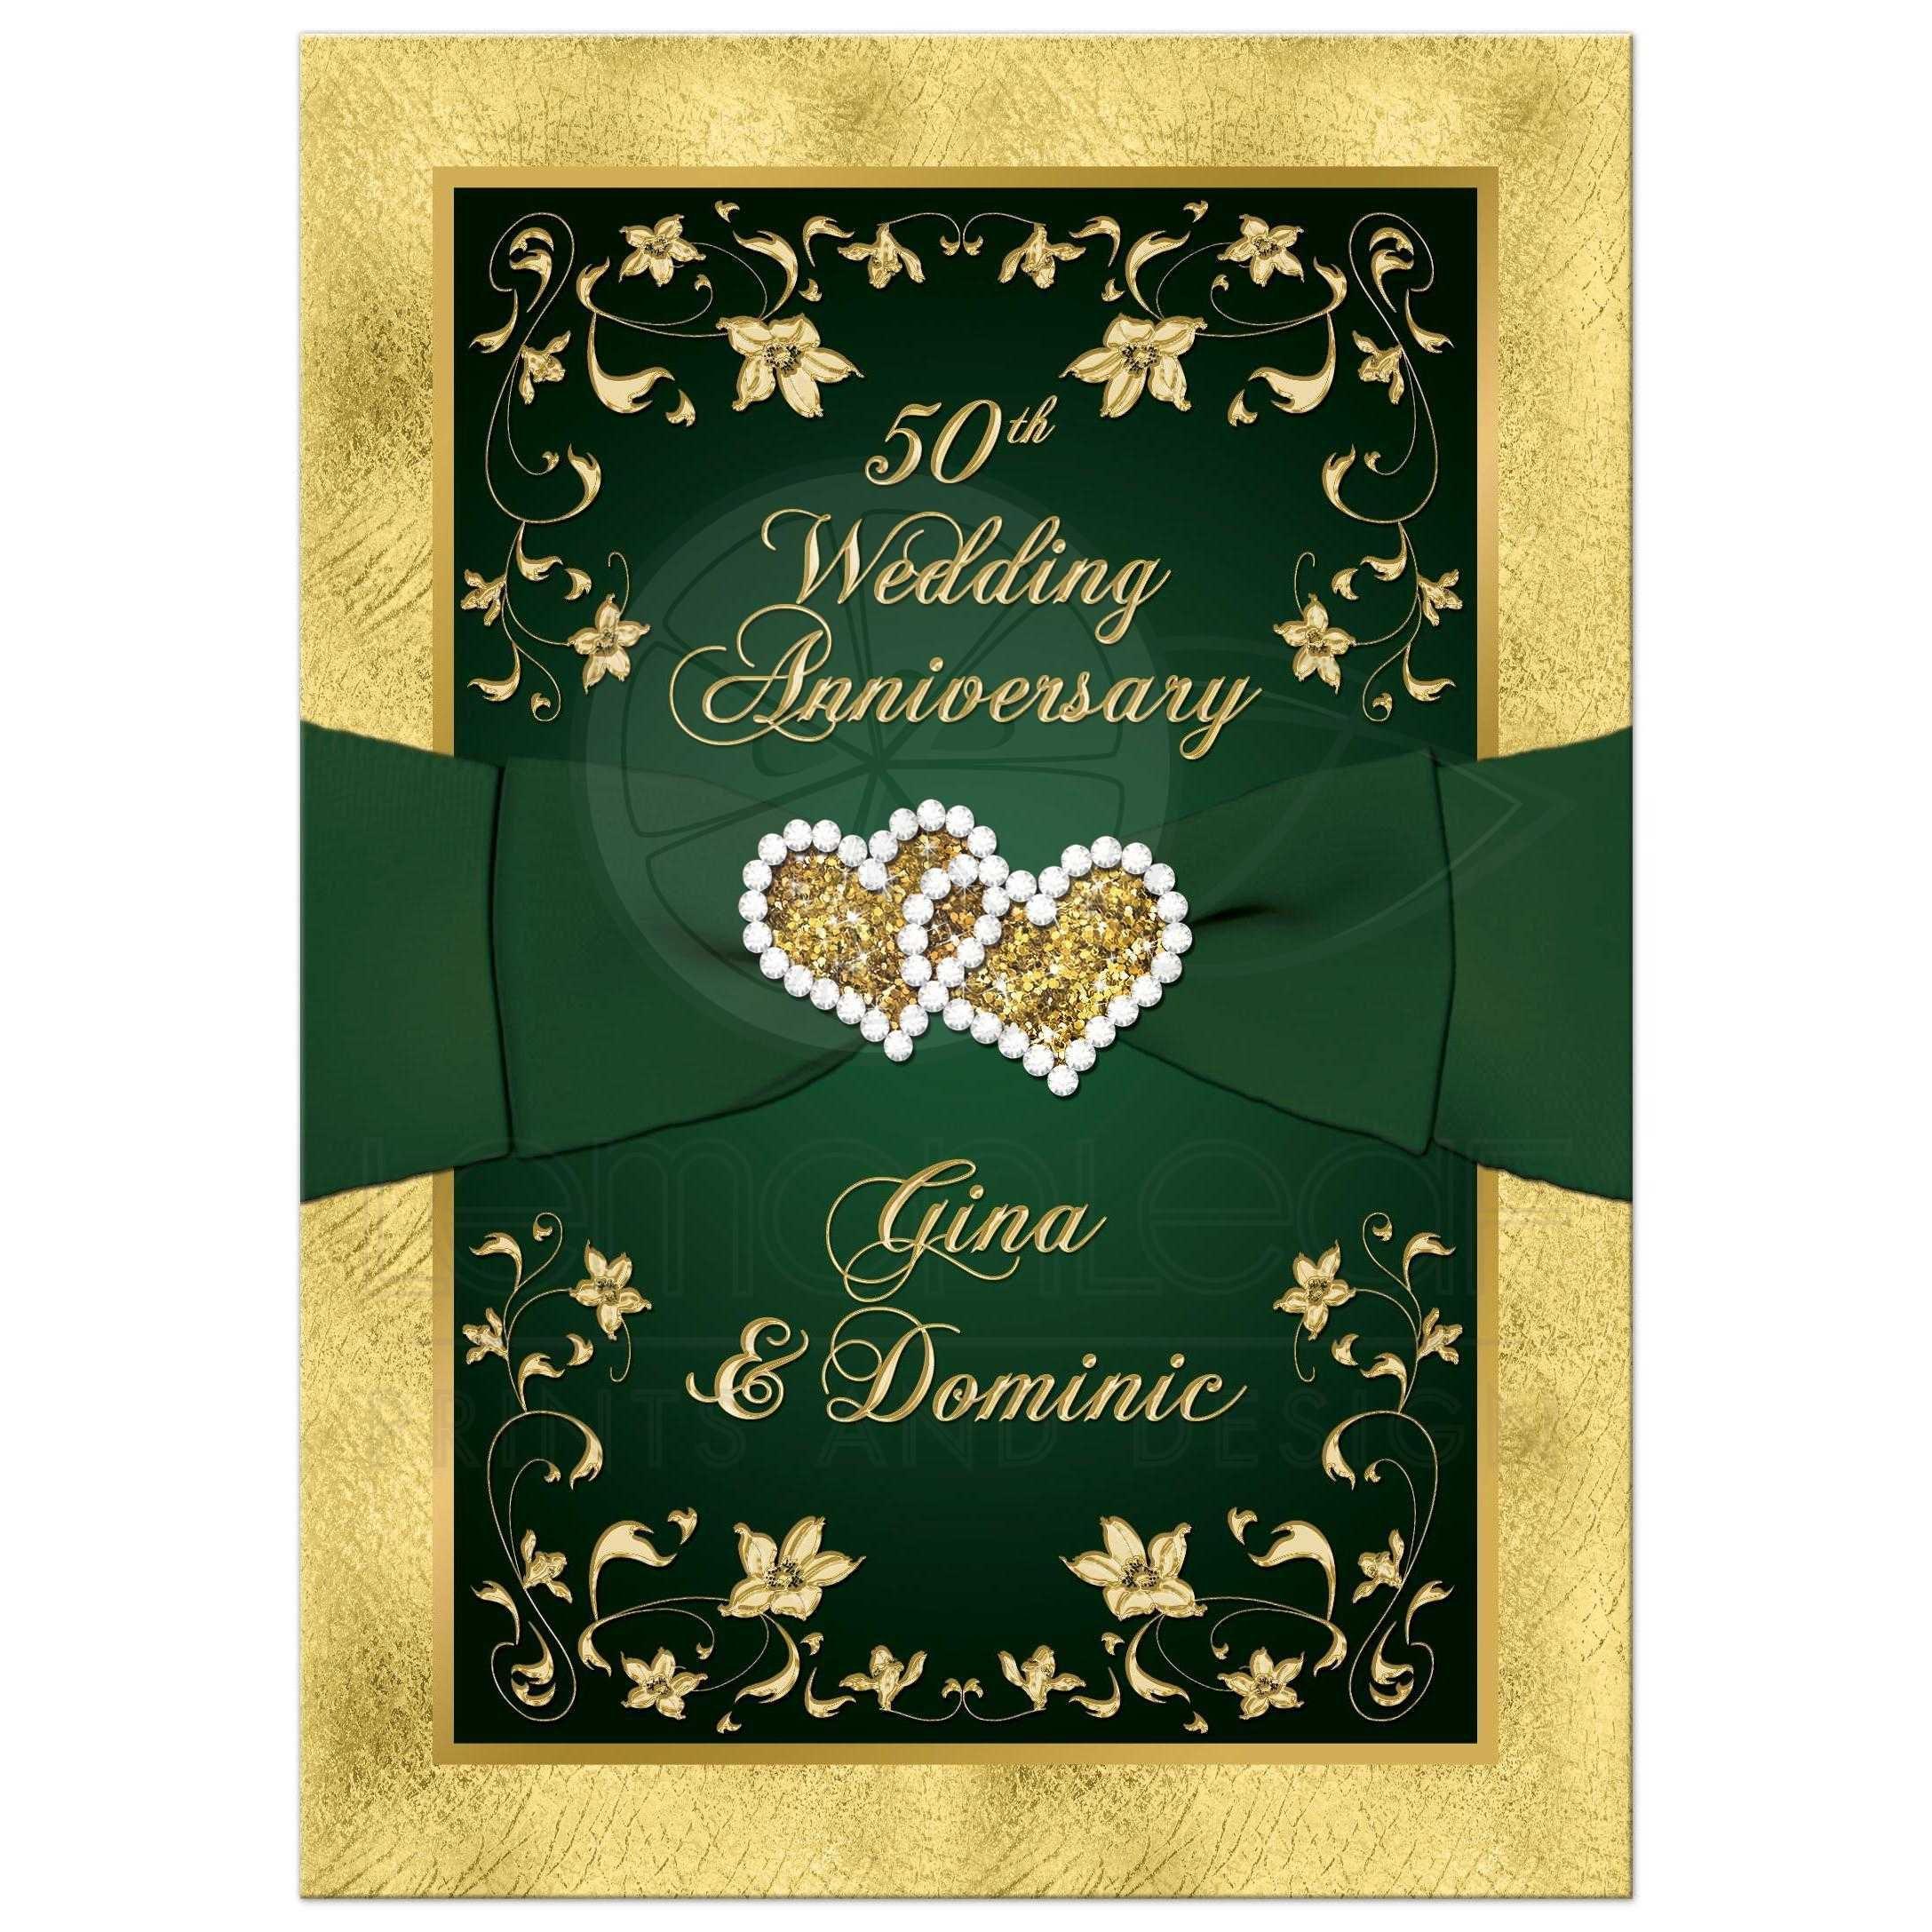 golden wedding anniversary invitation wording | Invitations card ...